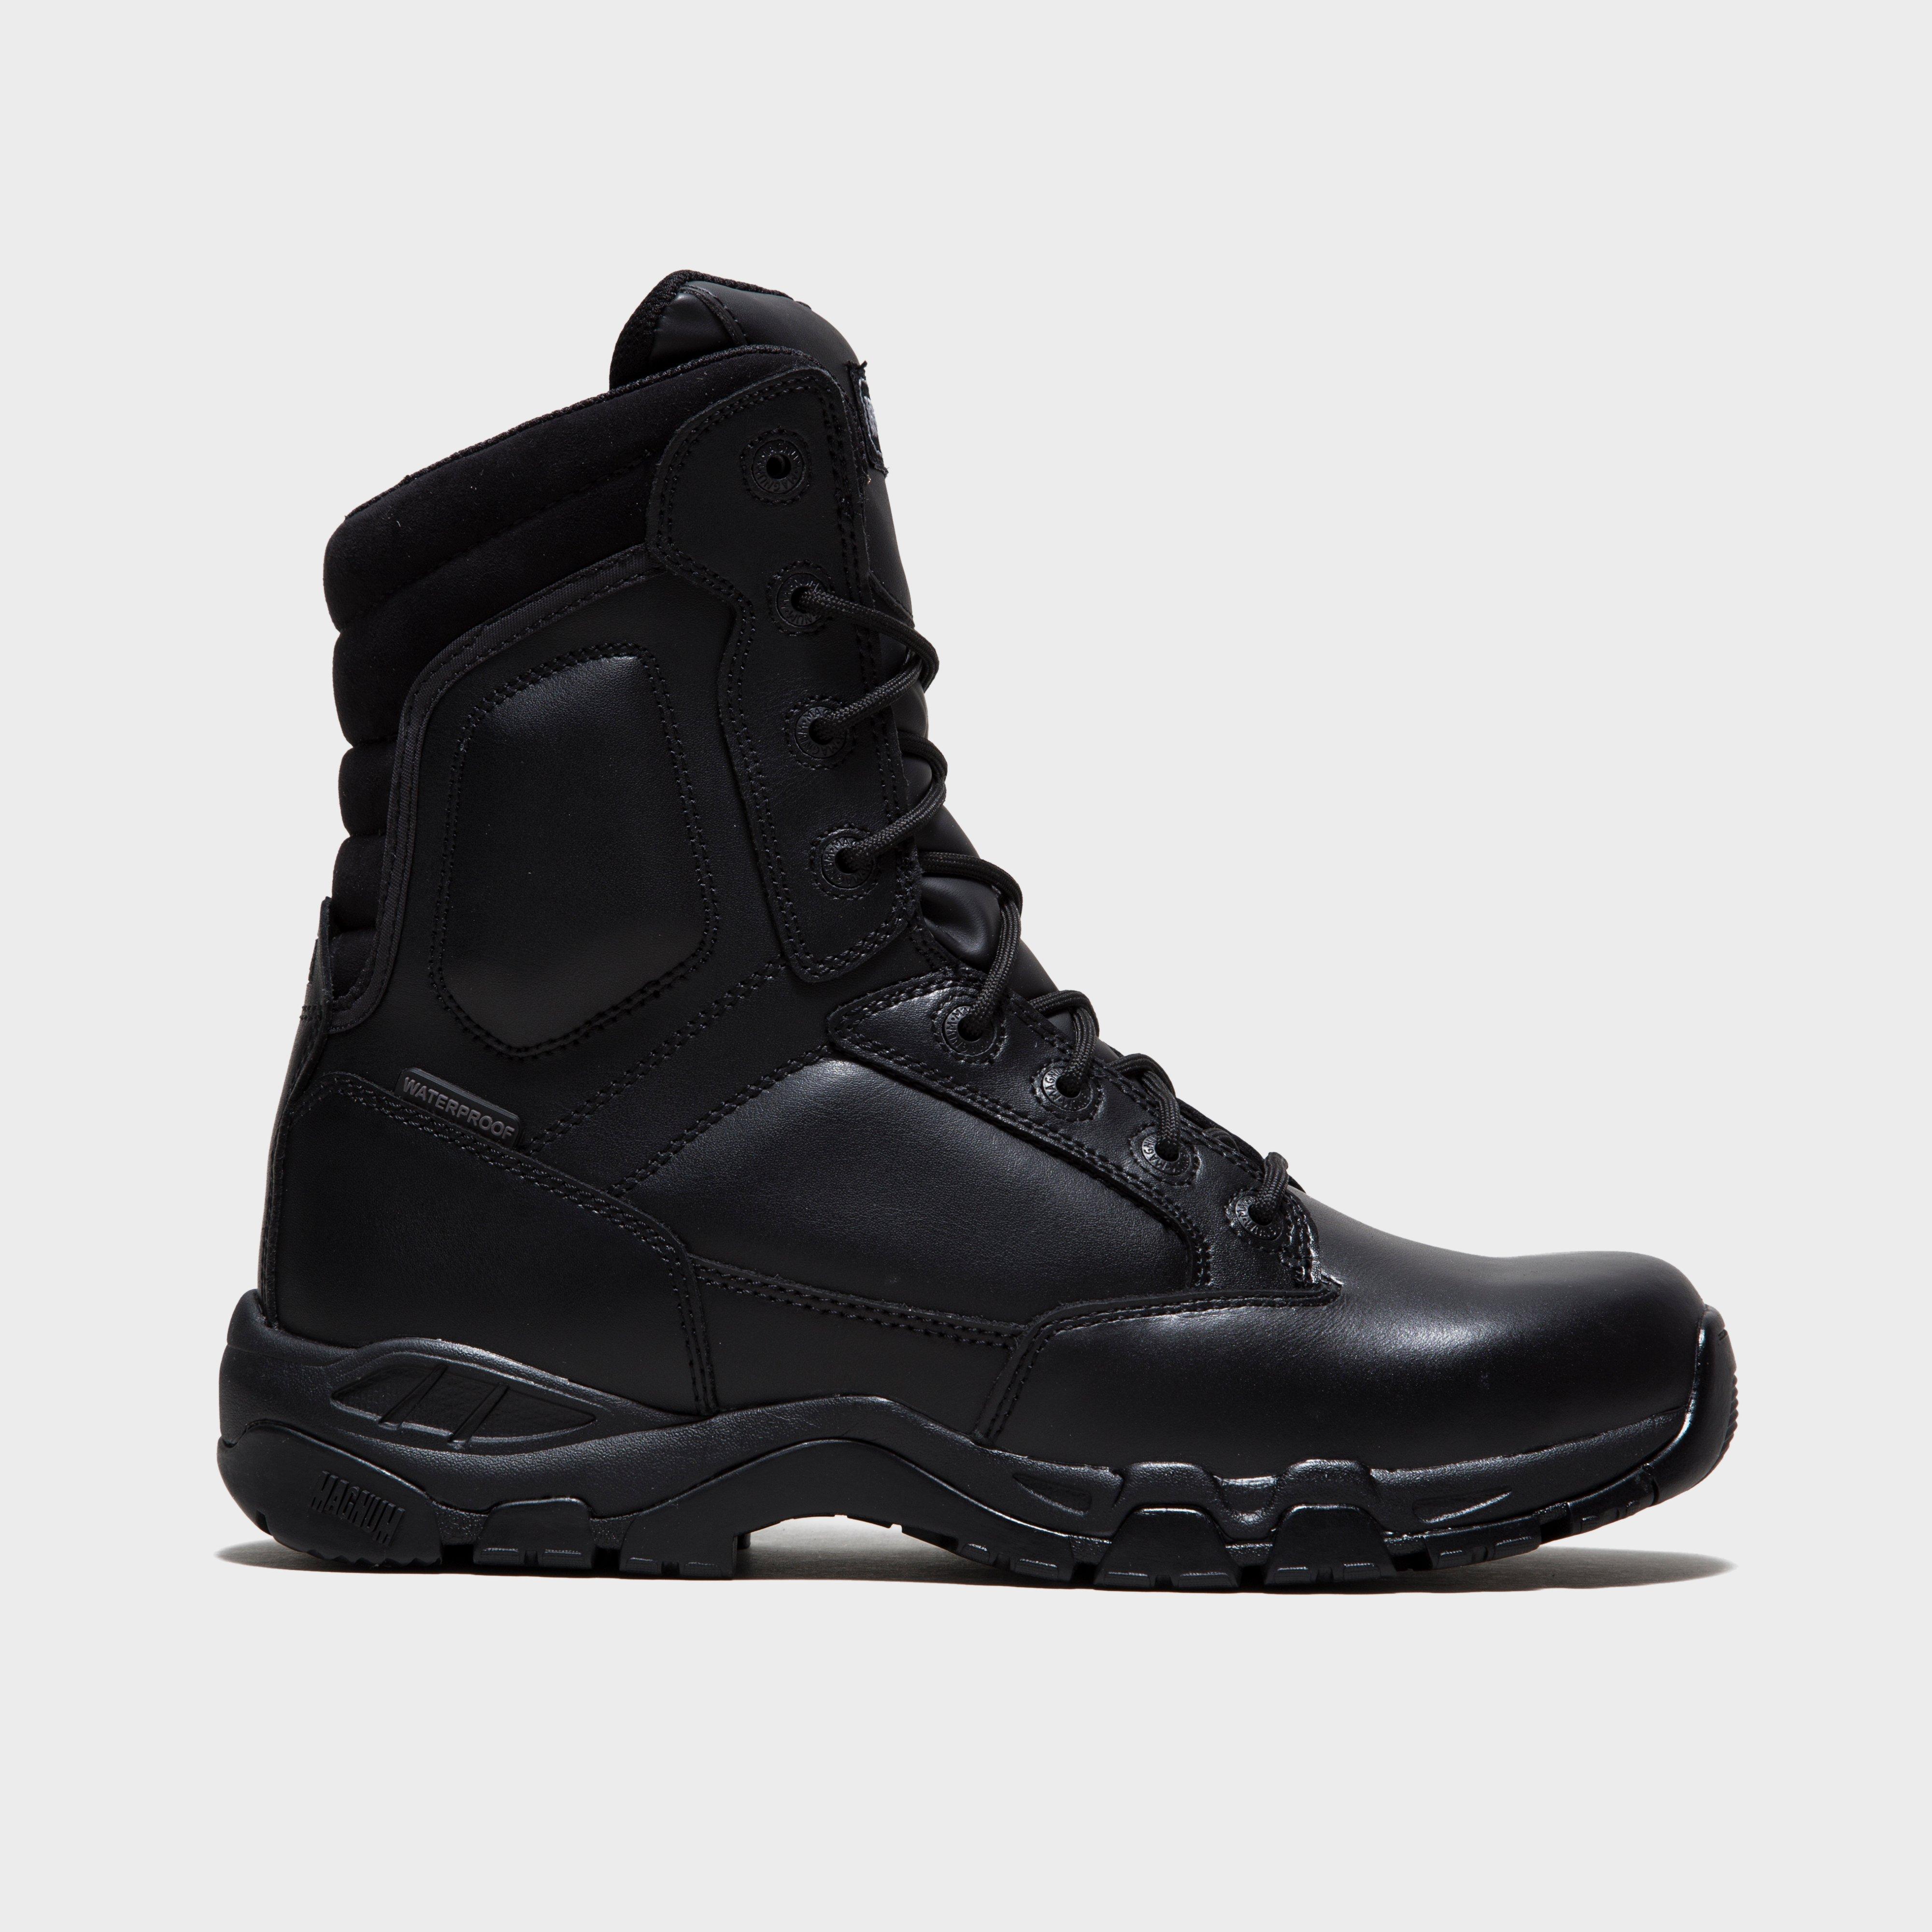 MAGNUM Men's Viper Pro Waterproof All Leather Boots £77 @ Blacks